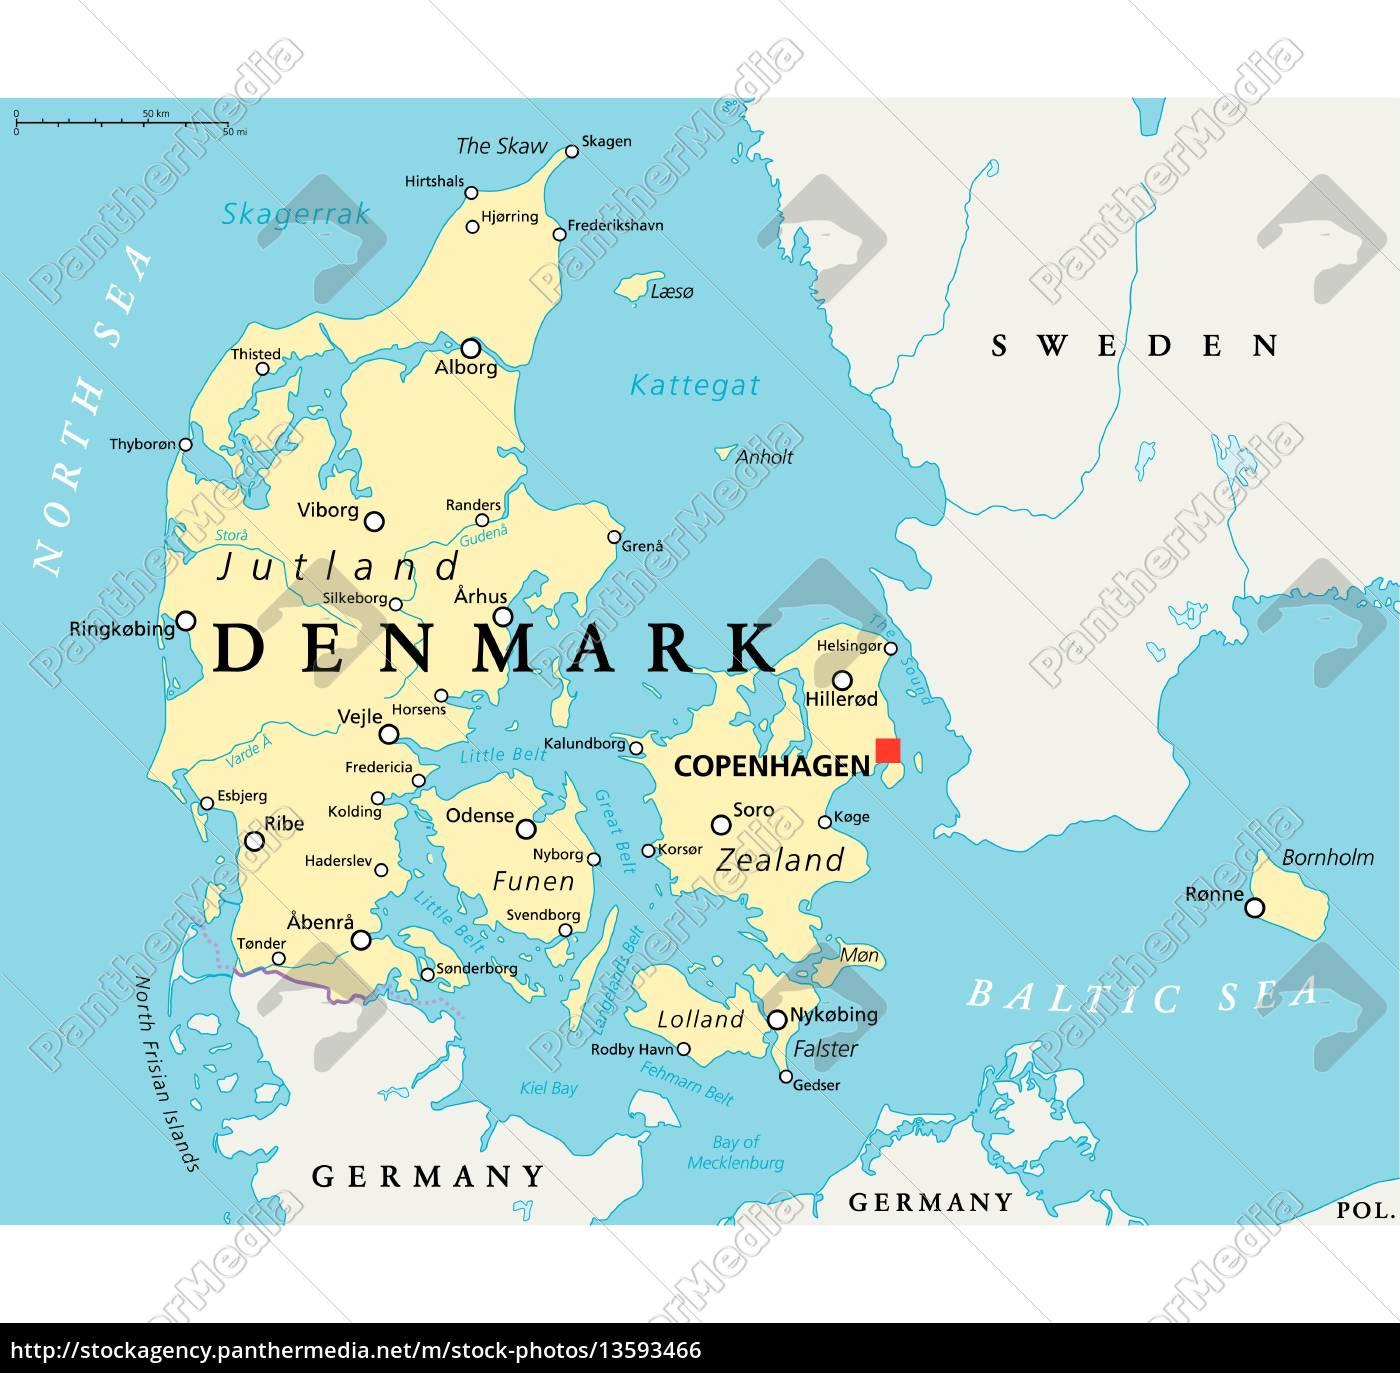 dinamarca mapa mapa político de dinamarca   Stockphoto   #13593466   Agencia de  dinamarca mapa